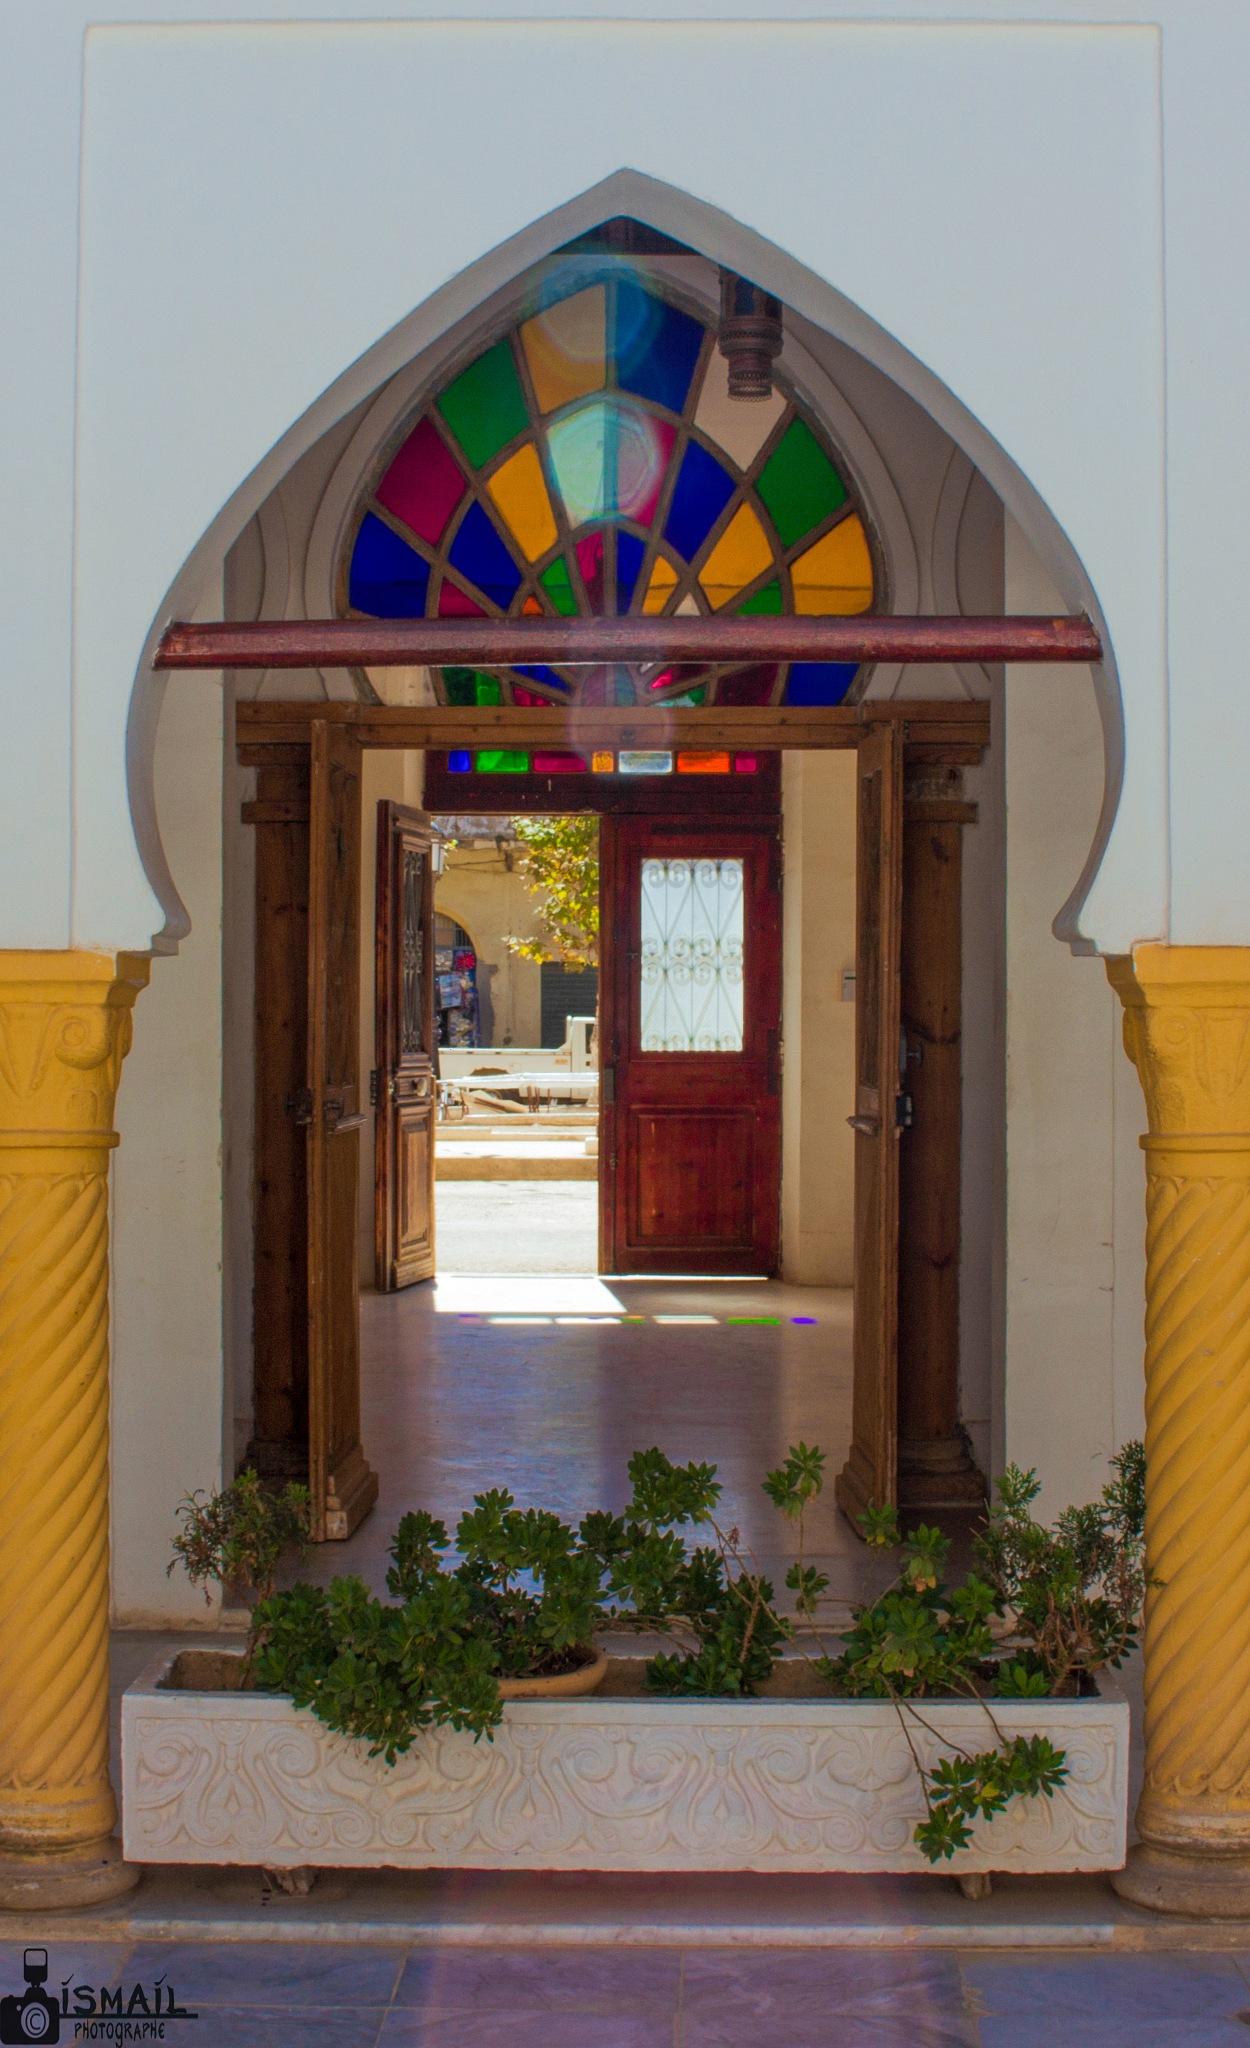 la maison de emir abdelkader by kadikismail